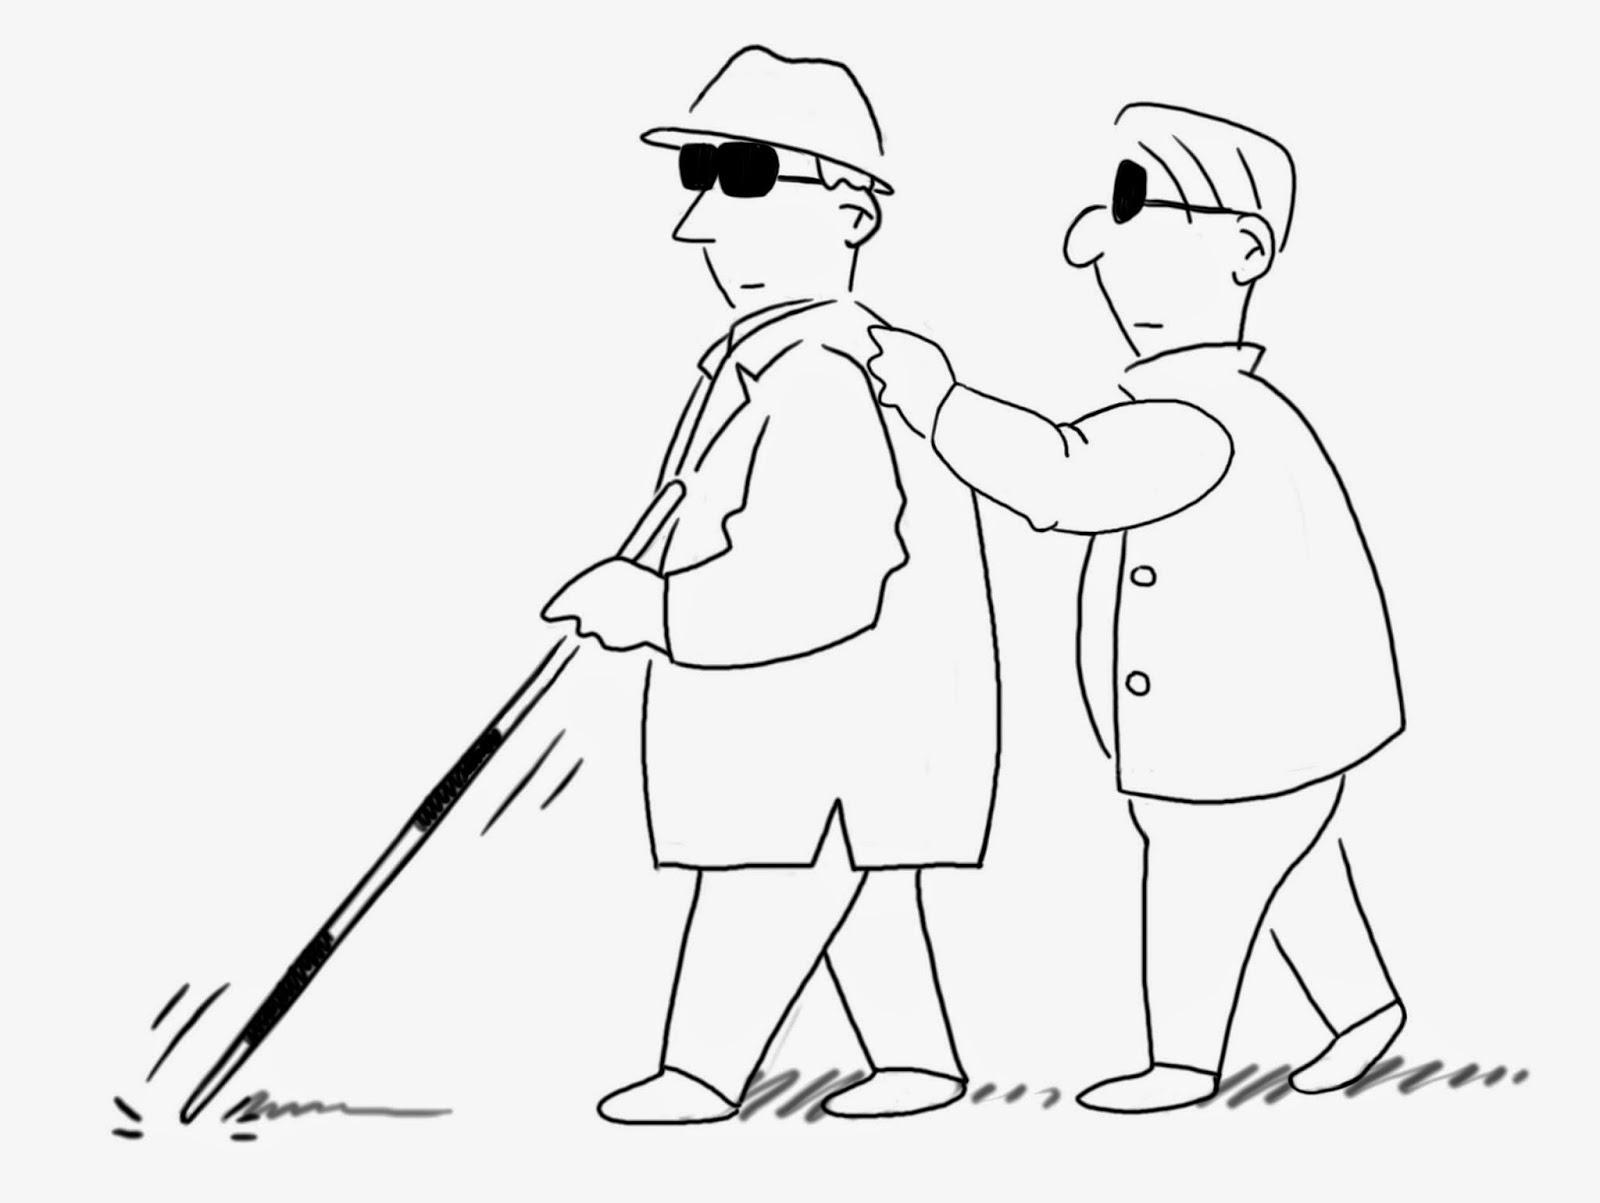 Blind leading the blind, having eyesight problems and